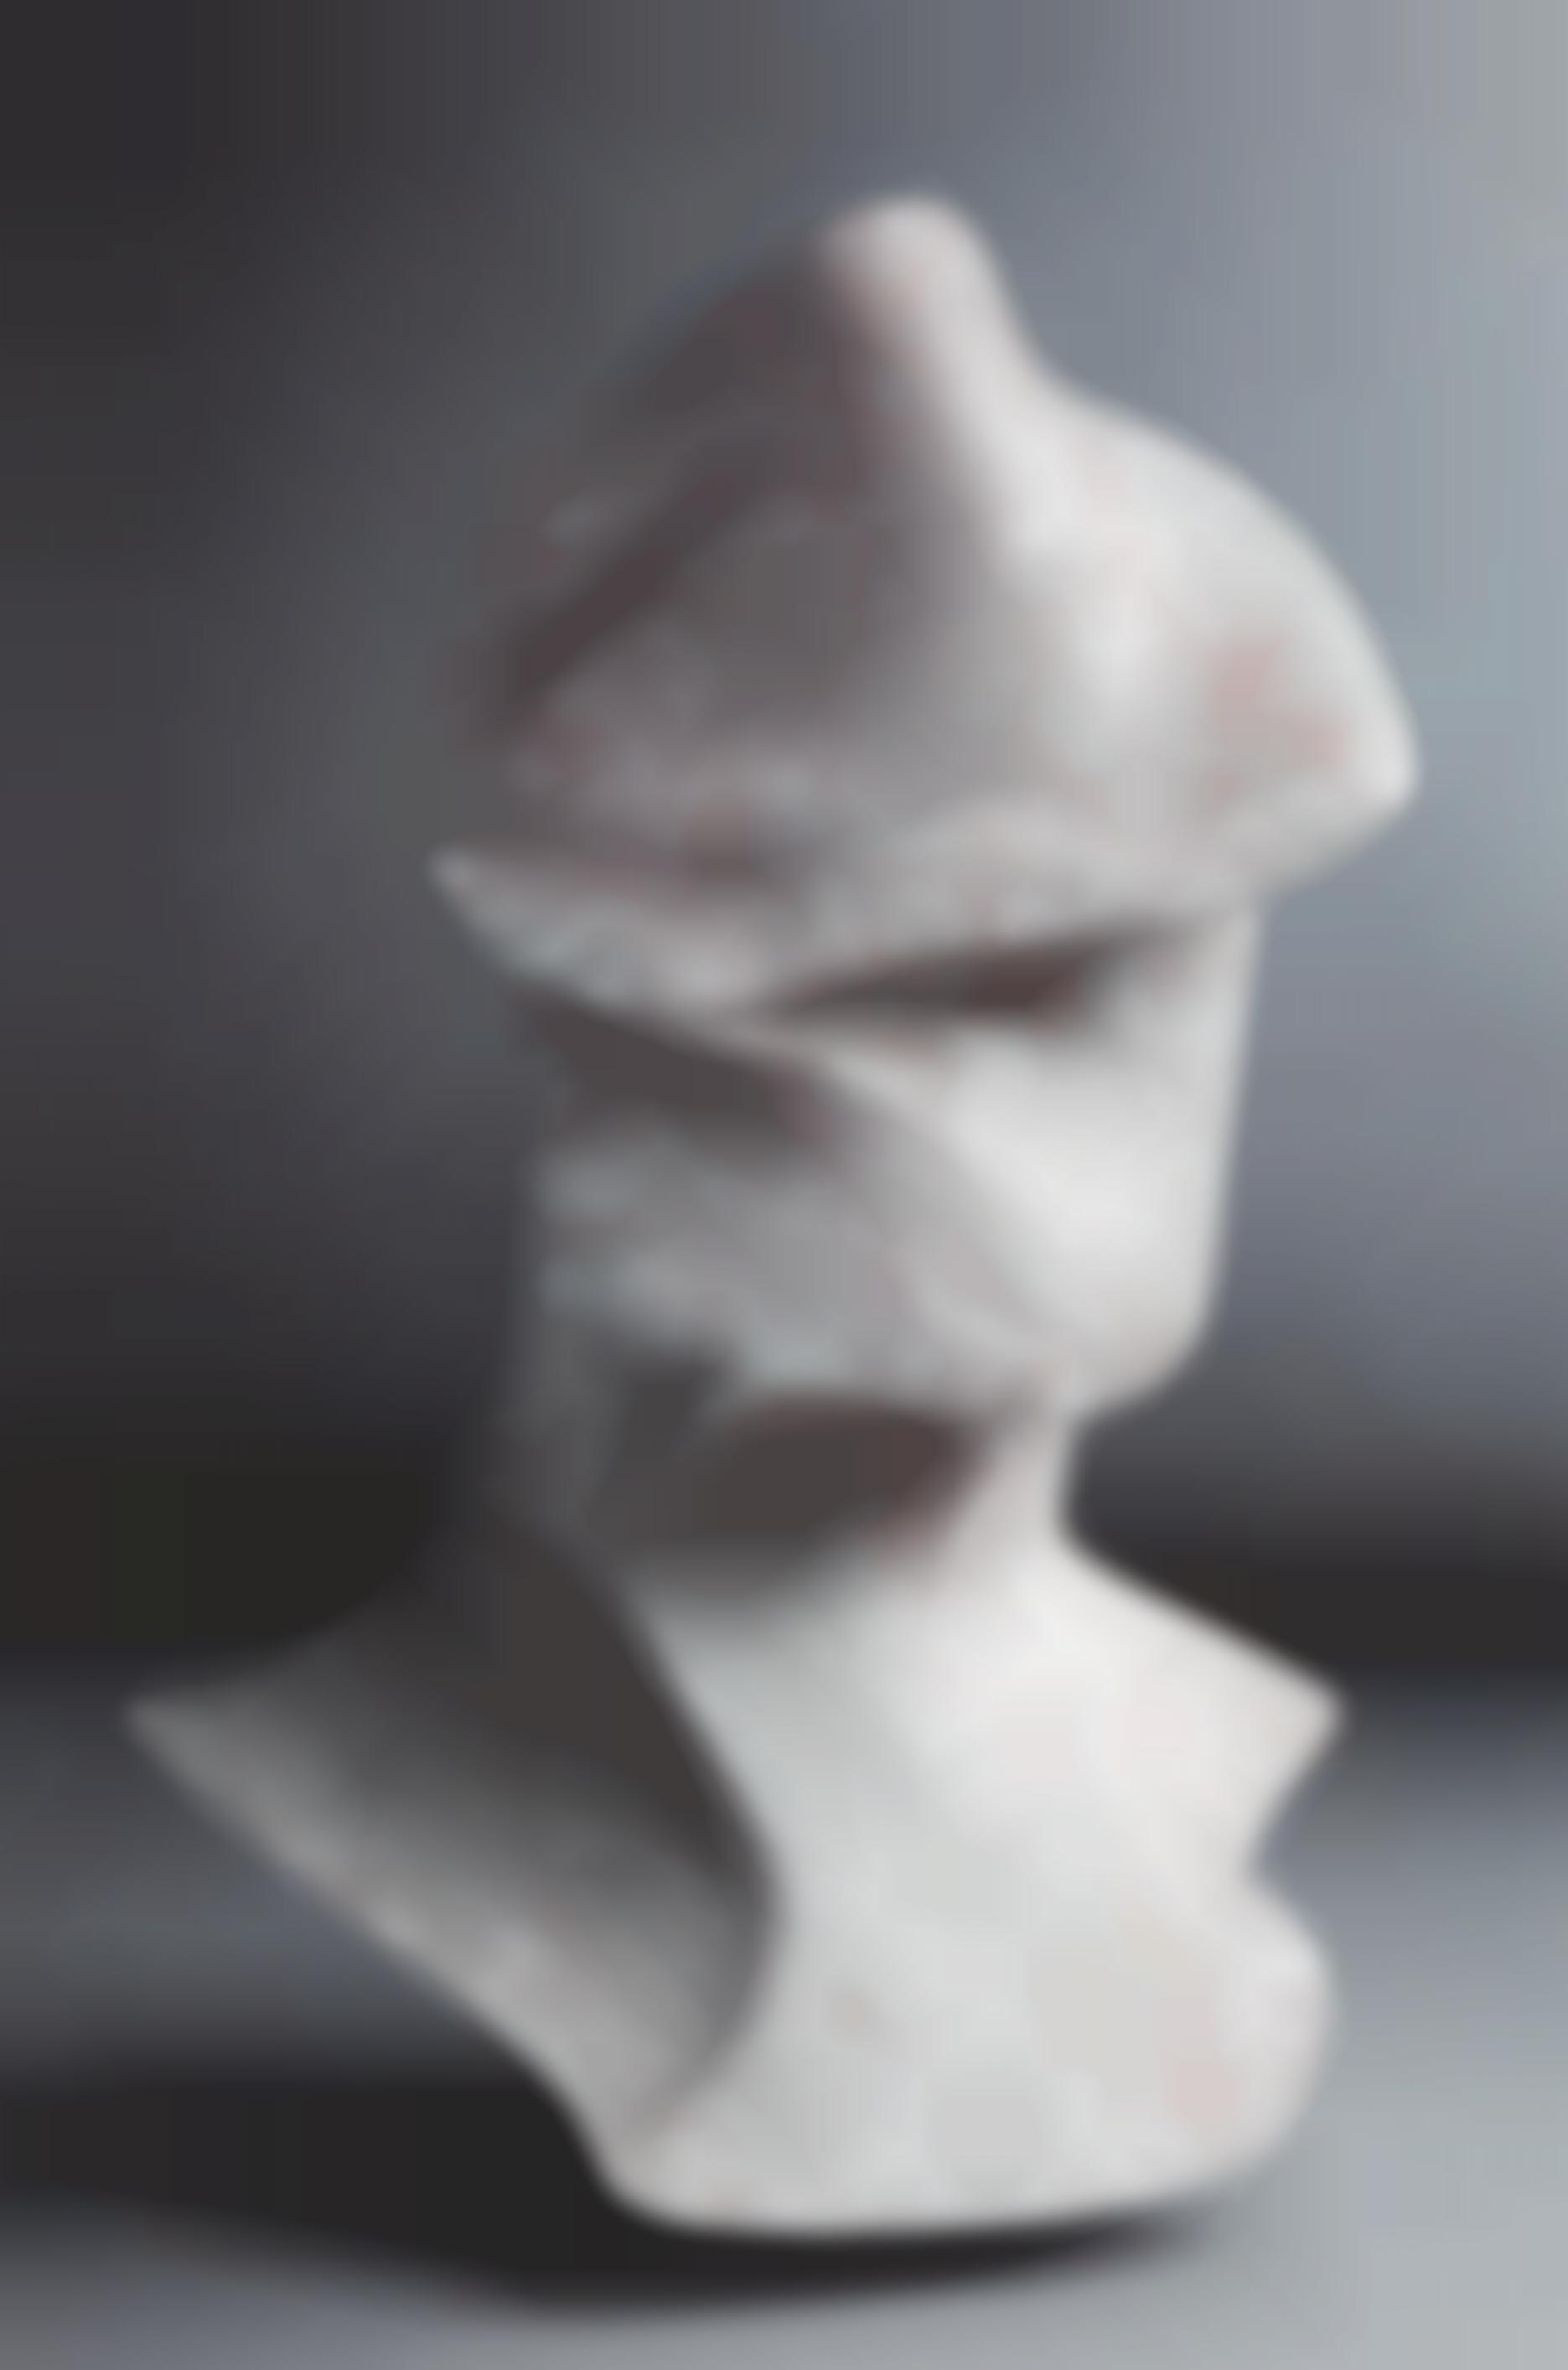 Jon Rafman-New Age Demanded, Wavy Marble-2013